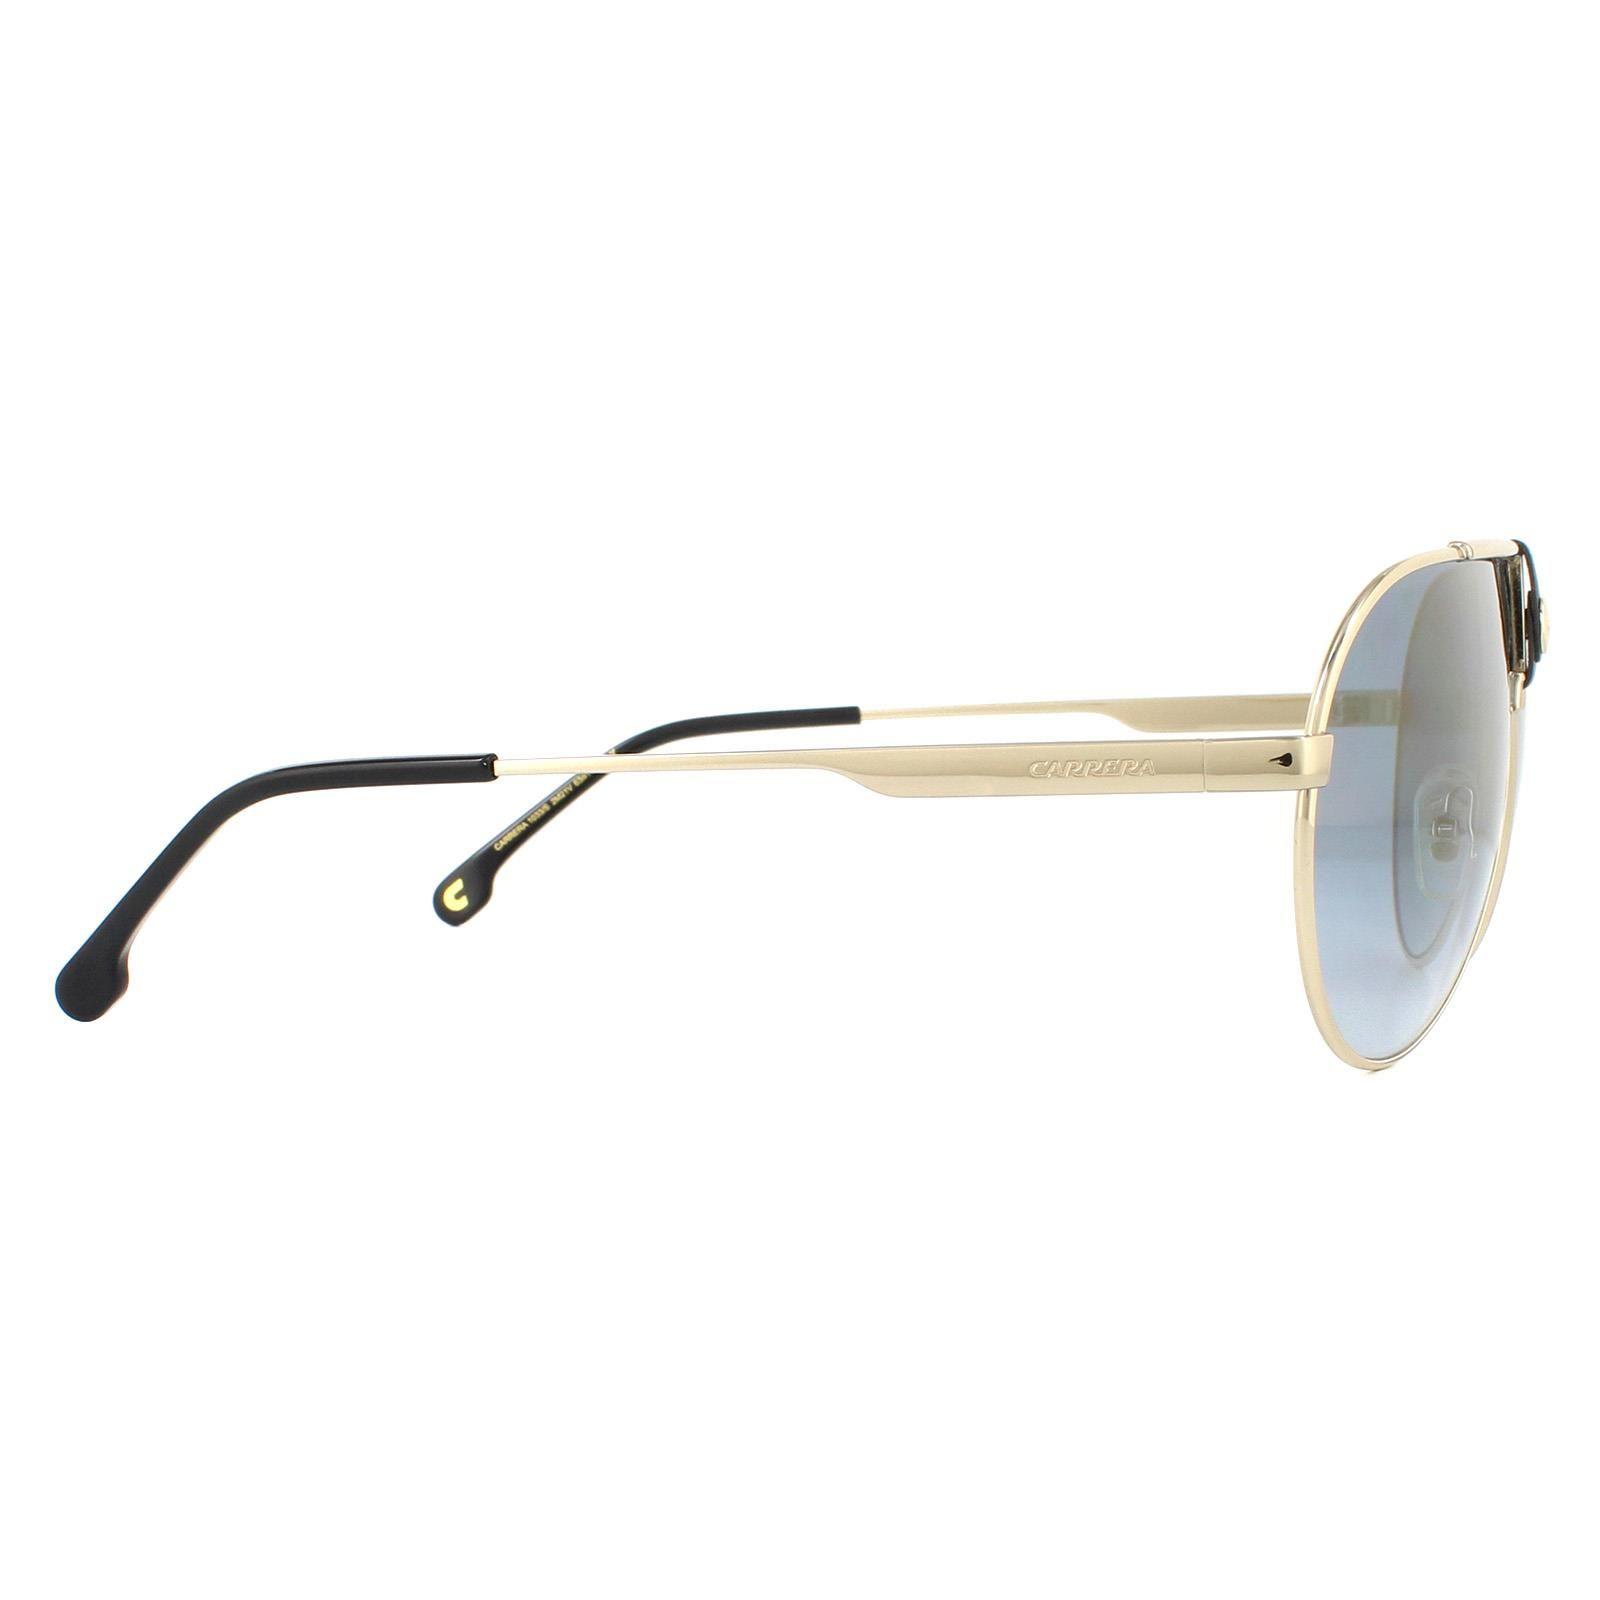 Carrera Sunglasses 1033/S 2M2 1V Black Gold Blue Gold Gradient Mirror